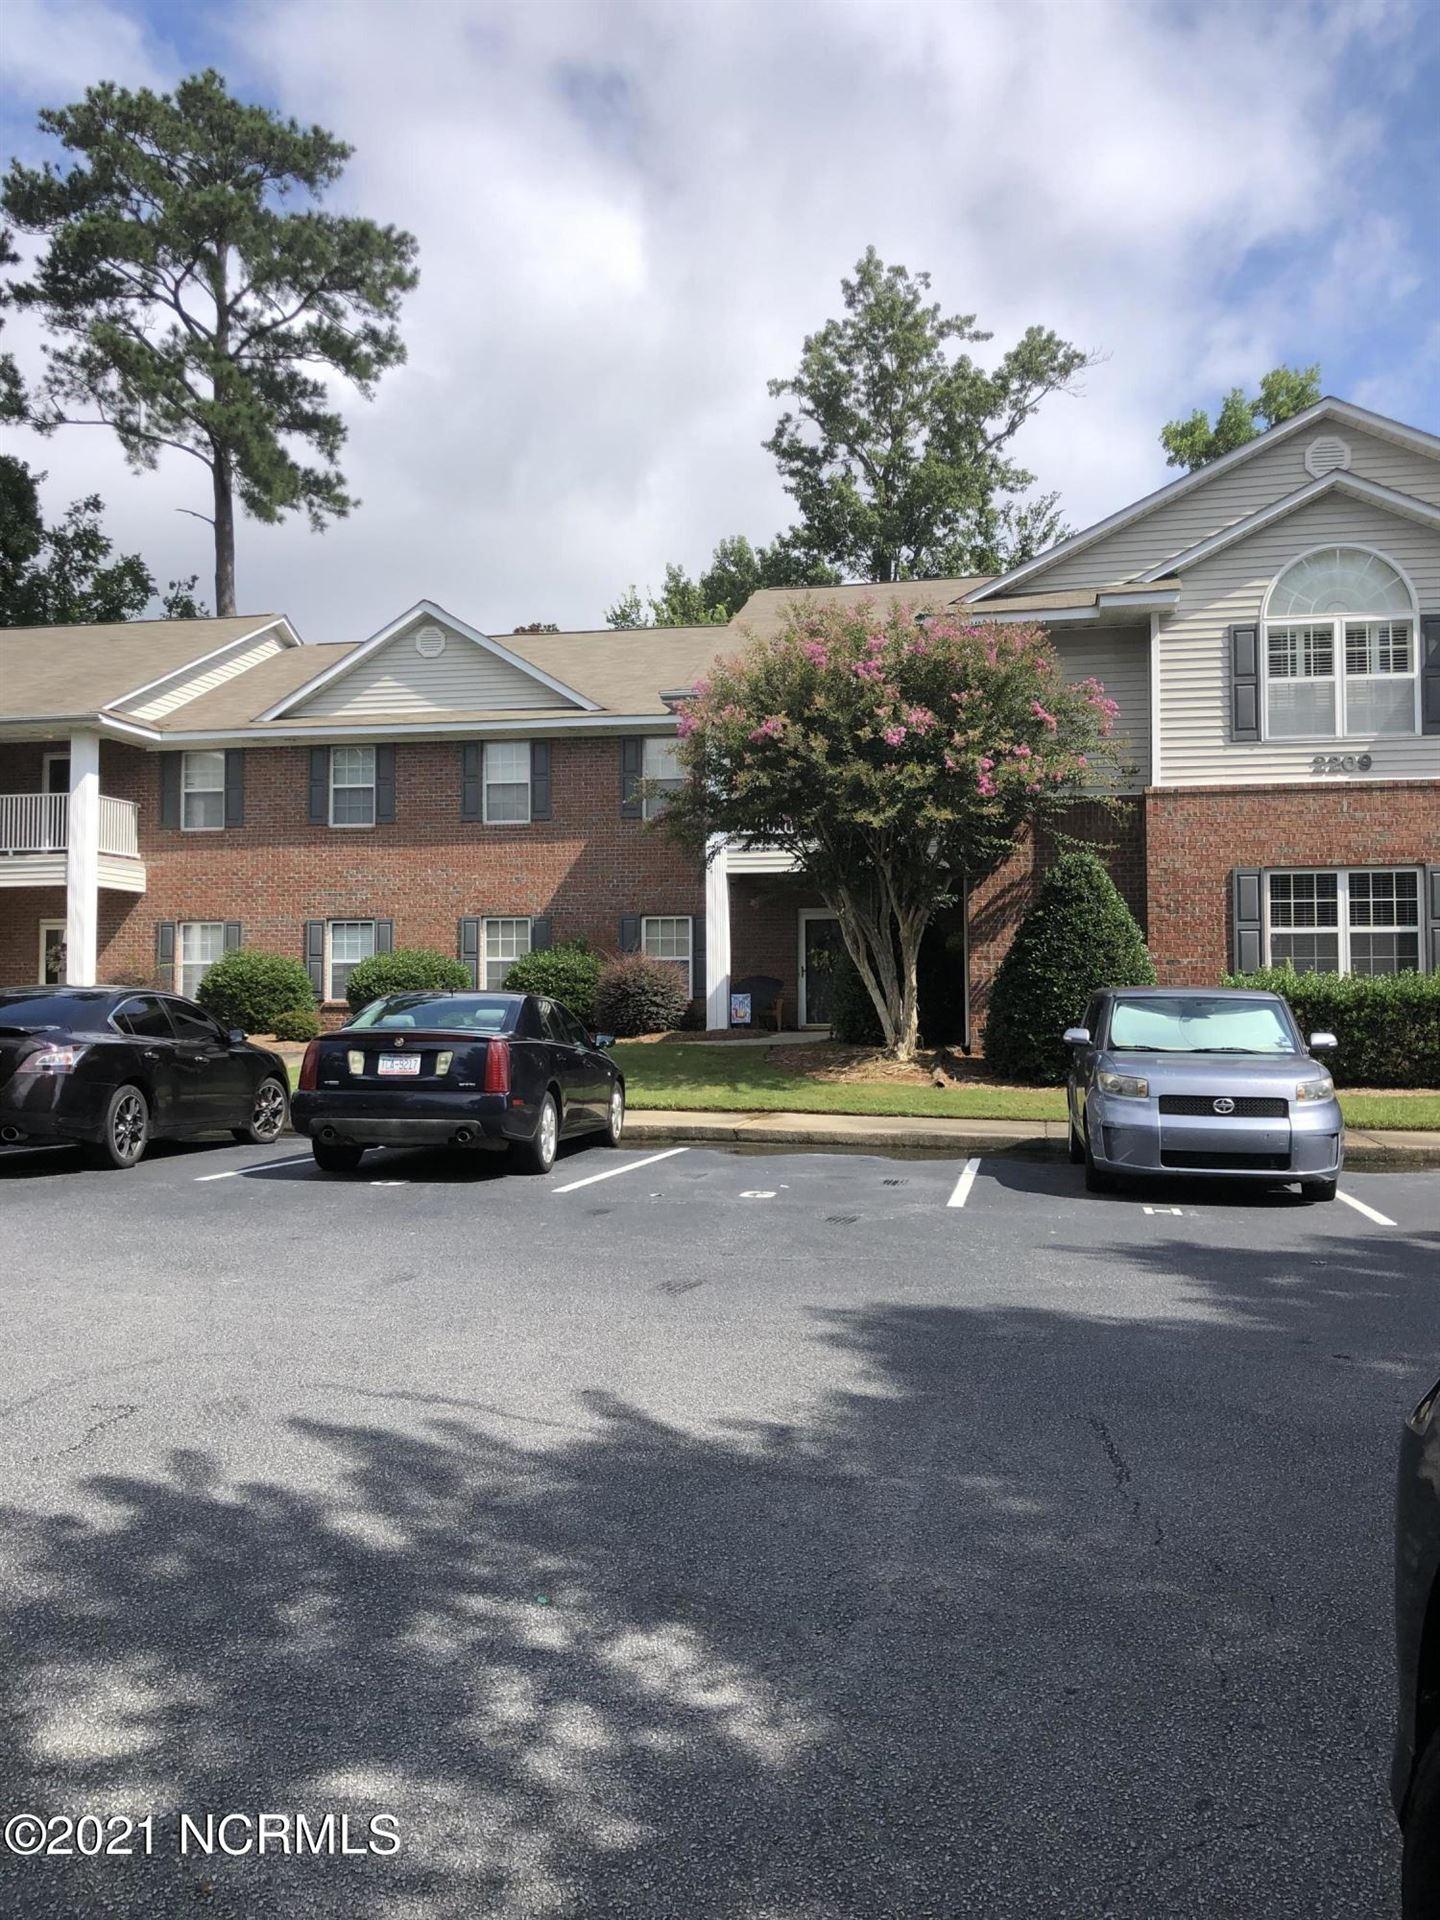 Photo of 2209 Locksley Woods Drive #G, Greenville, NC 27858 (MLS # 100285092)